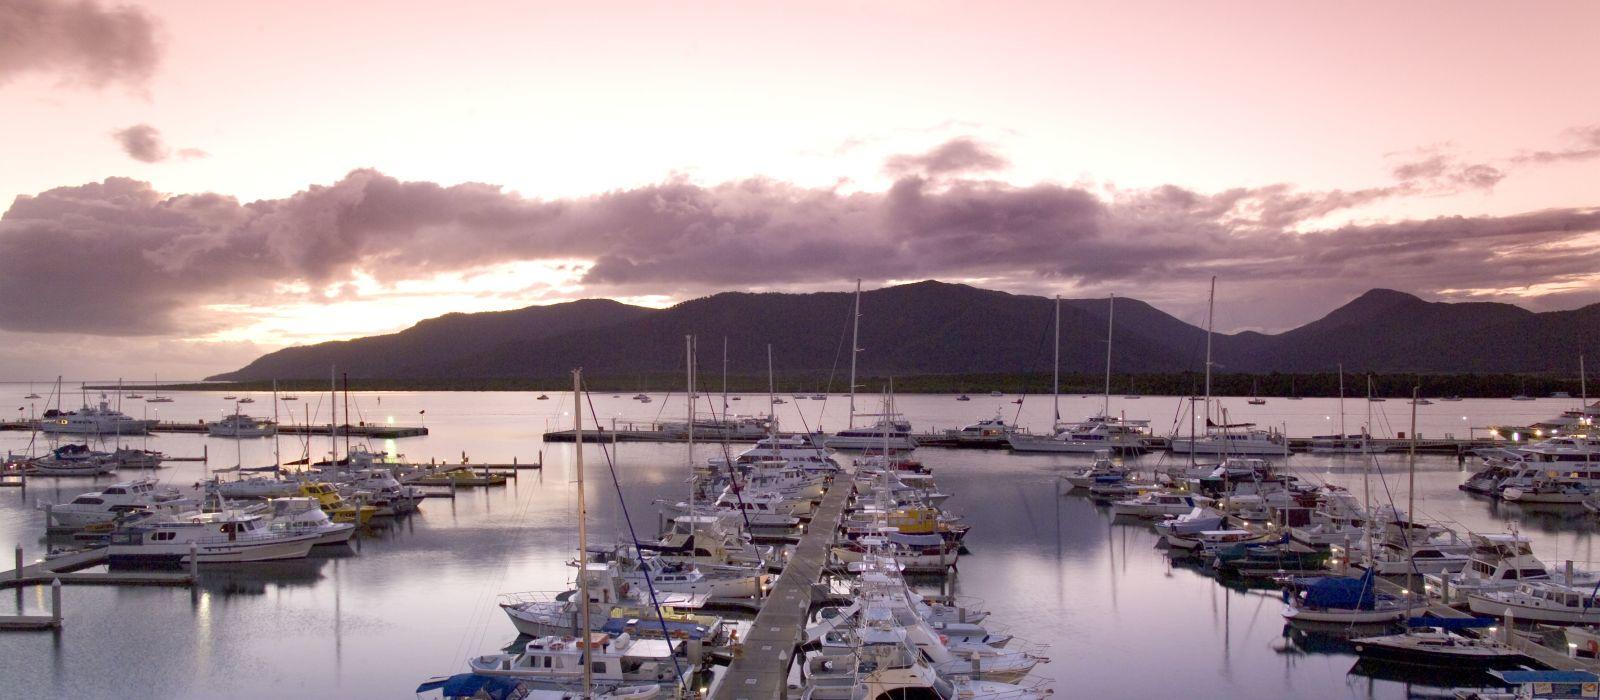 Hotel Shangri-La , The Marina, Cairns Australien